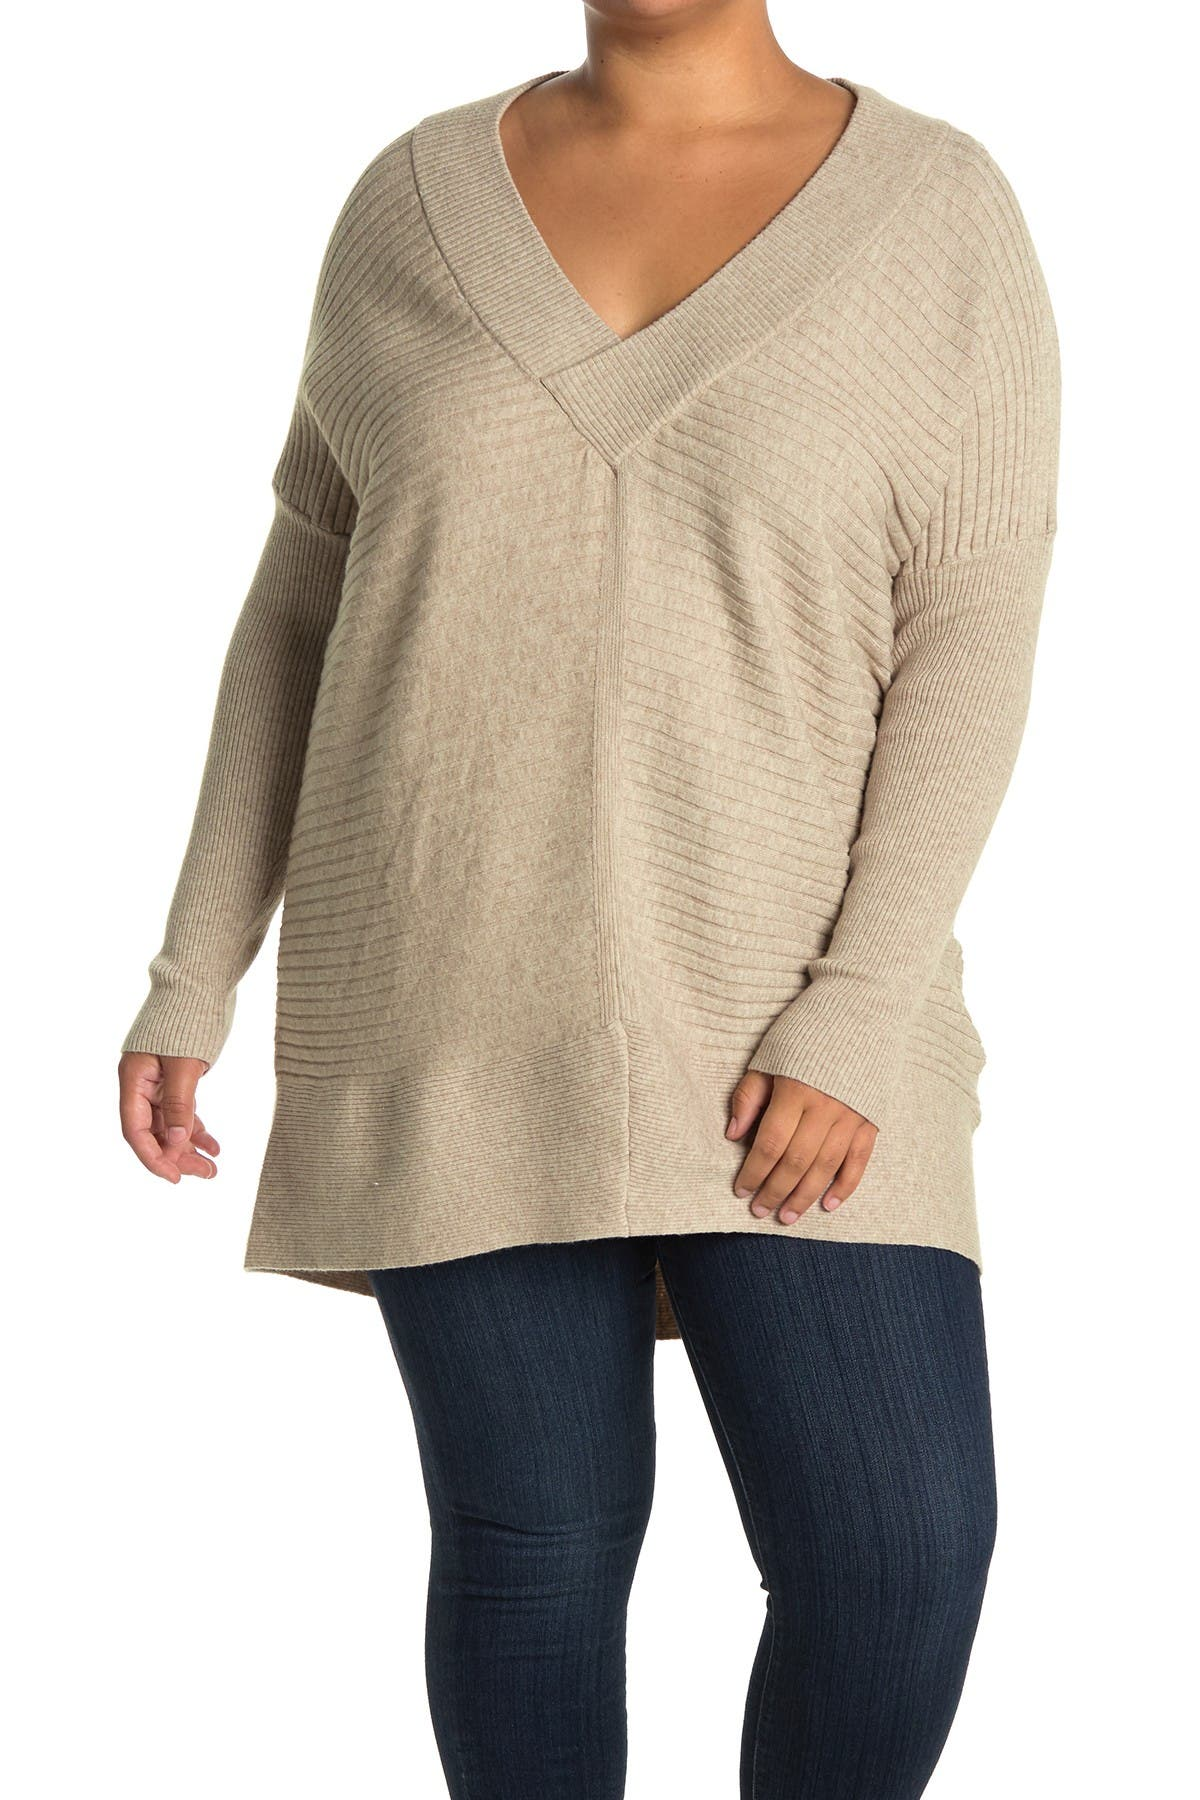 Image of STITCHDROP V-Neck Knit Sweater